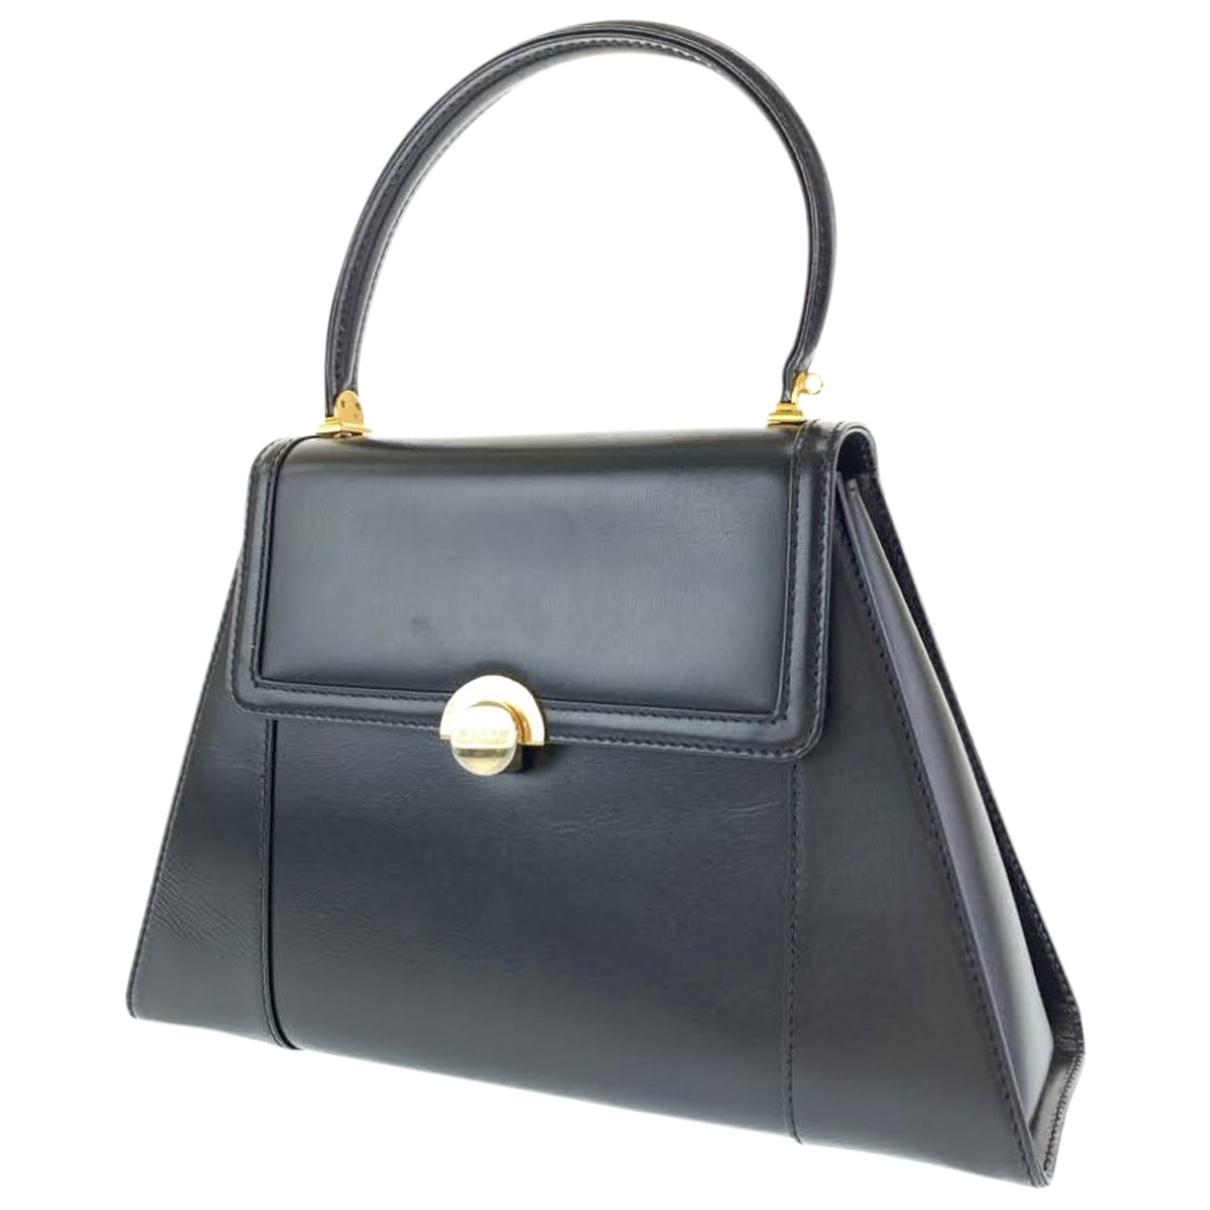 Bally N Leather handbag for Women N